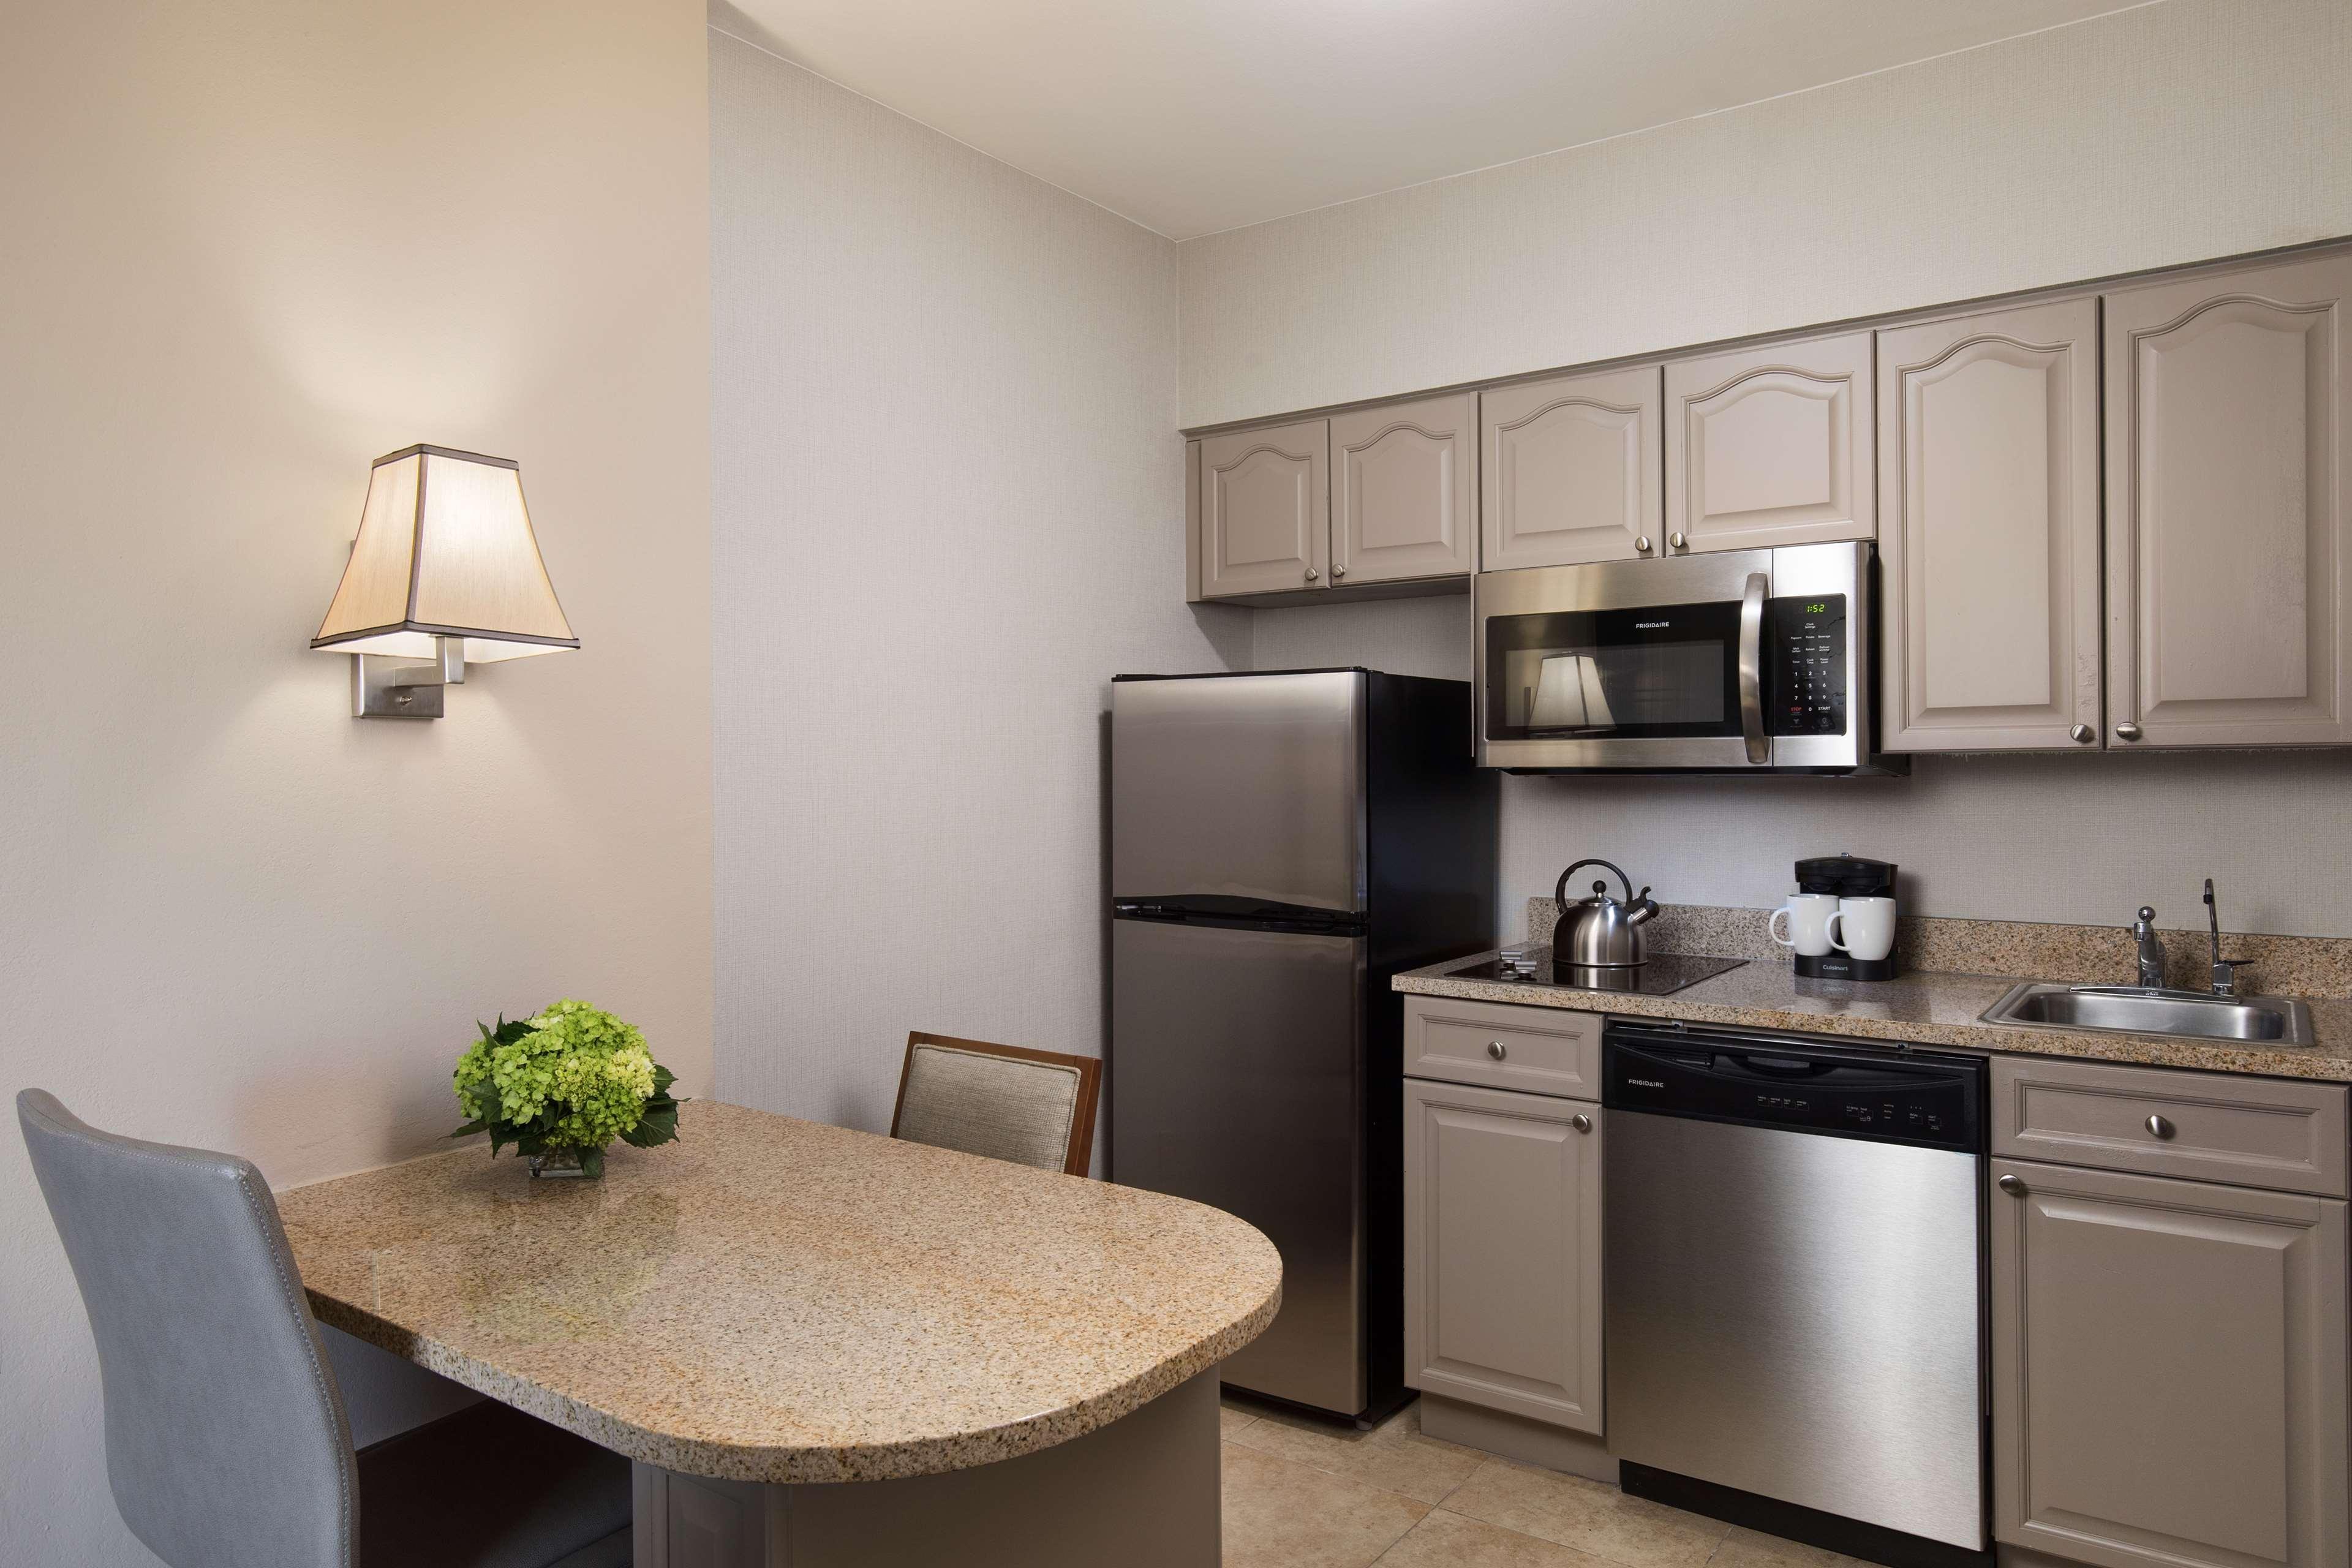 Homewood Suites by Hilton Lubbock image 18